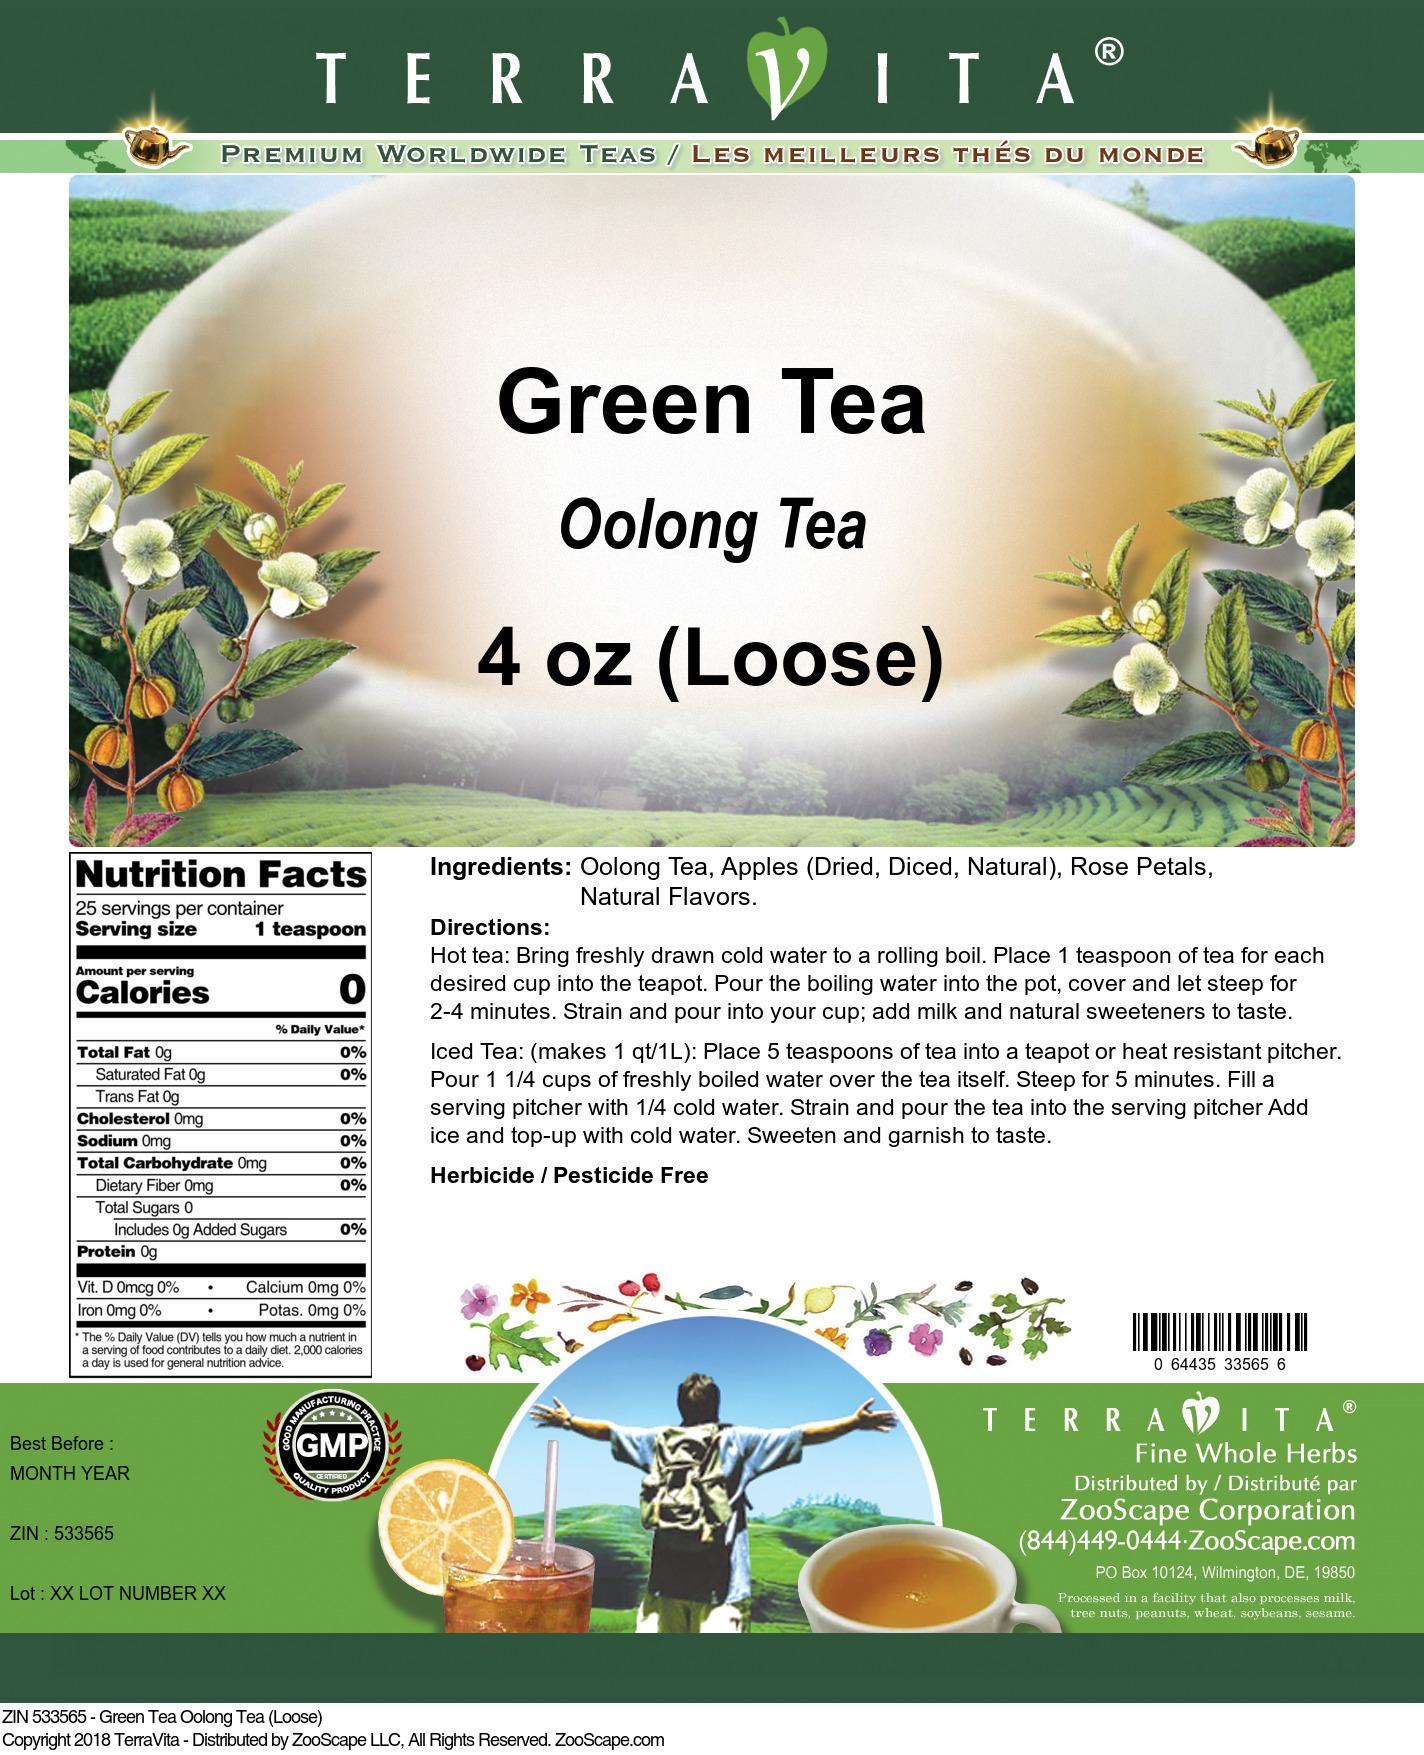 Green Tea Oolong Tea (Loose)